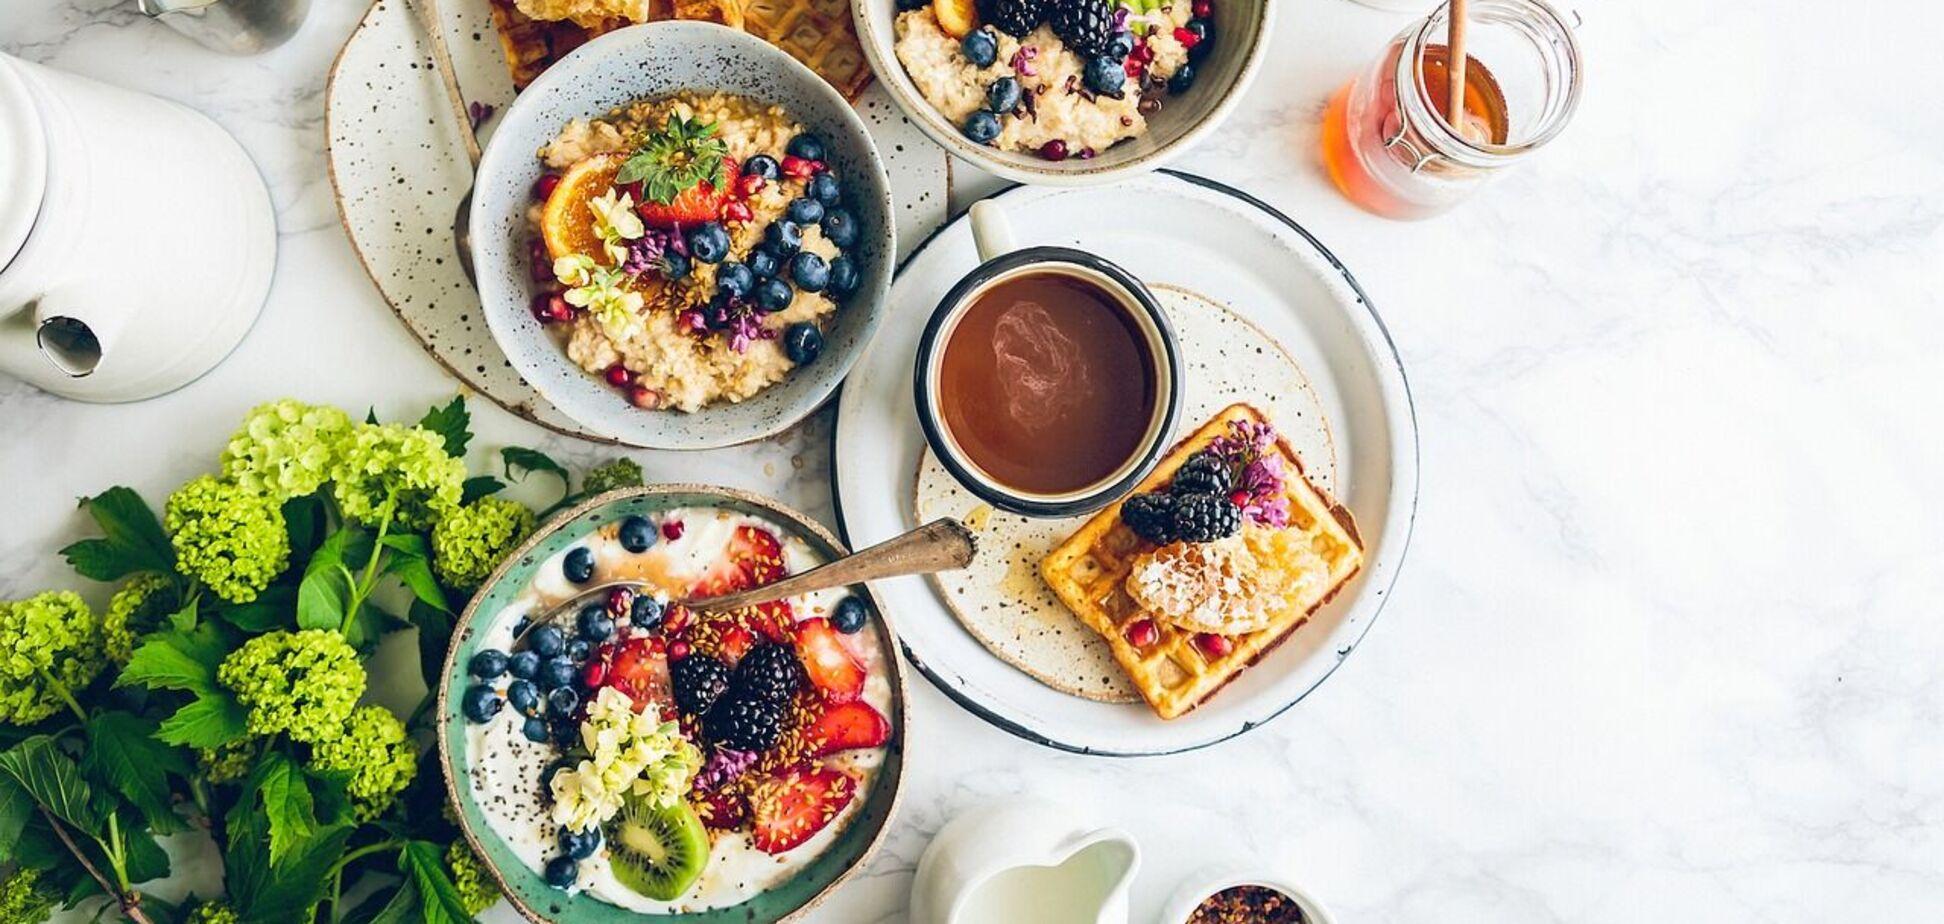 Їжа на сніданок